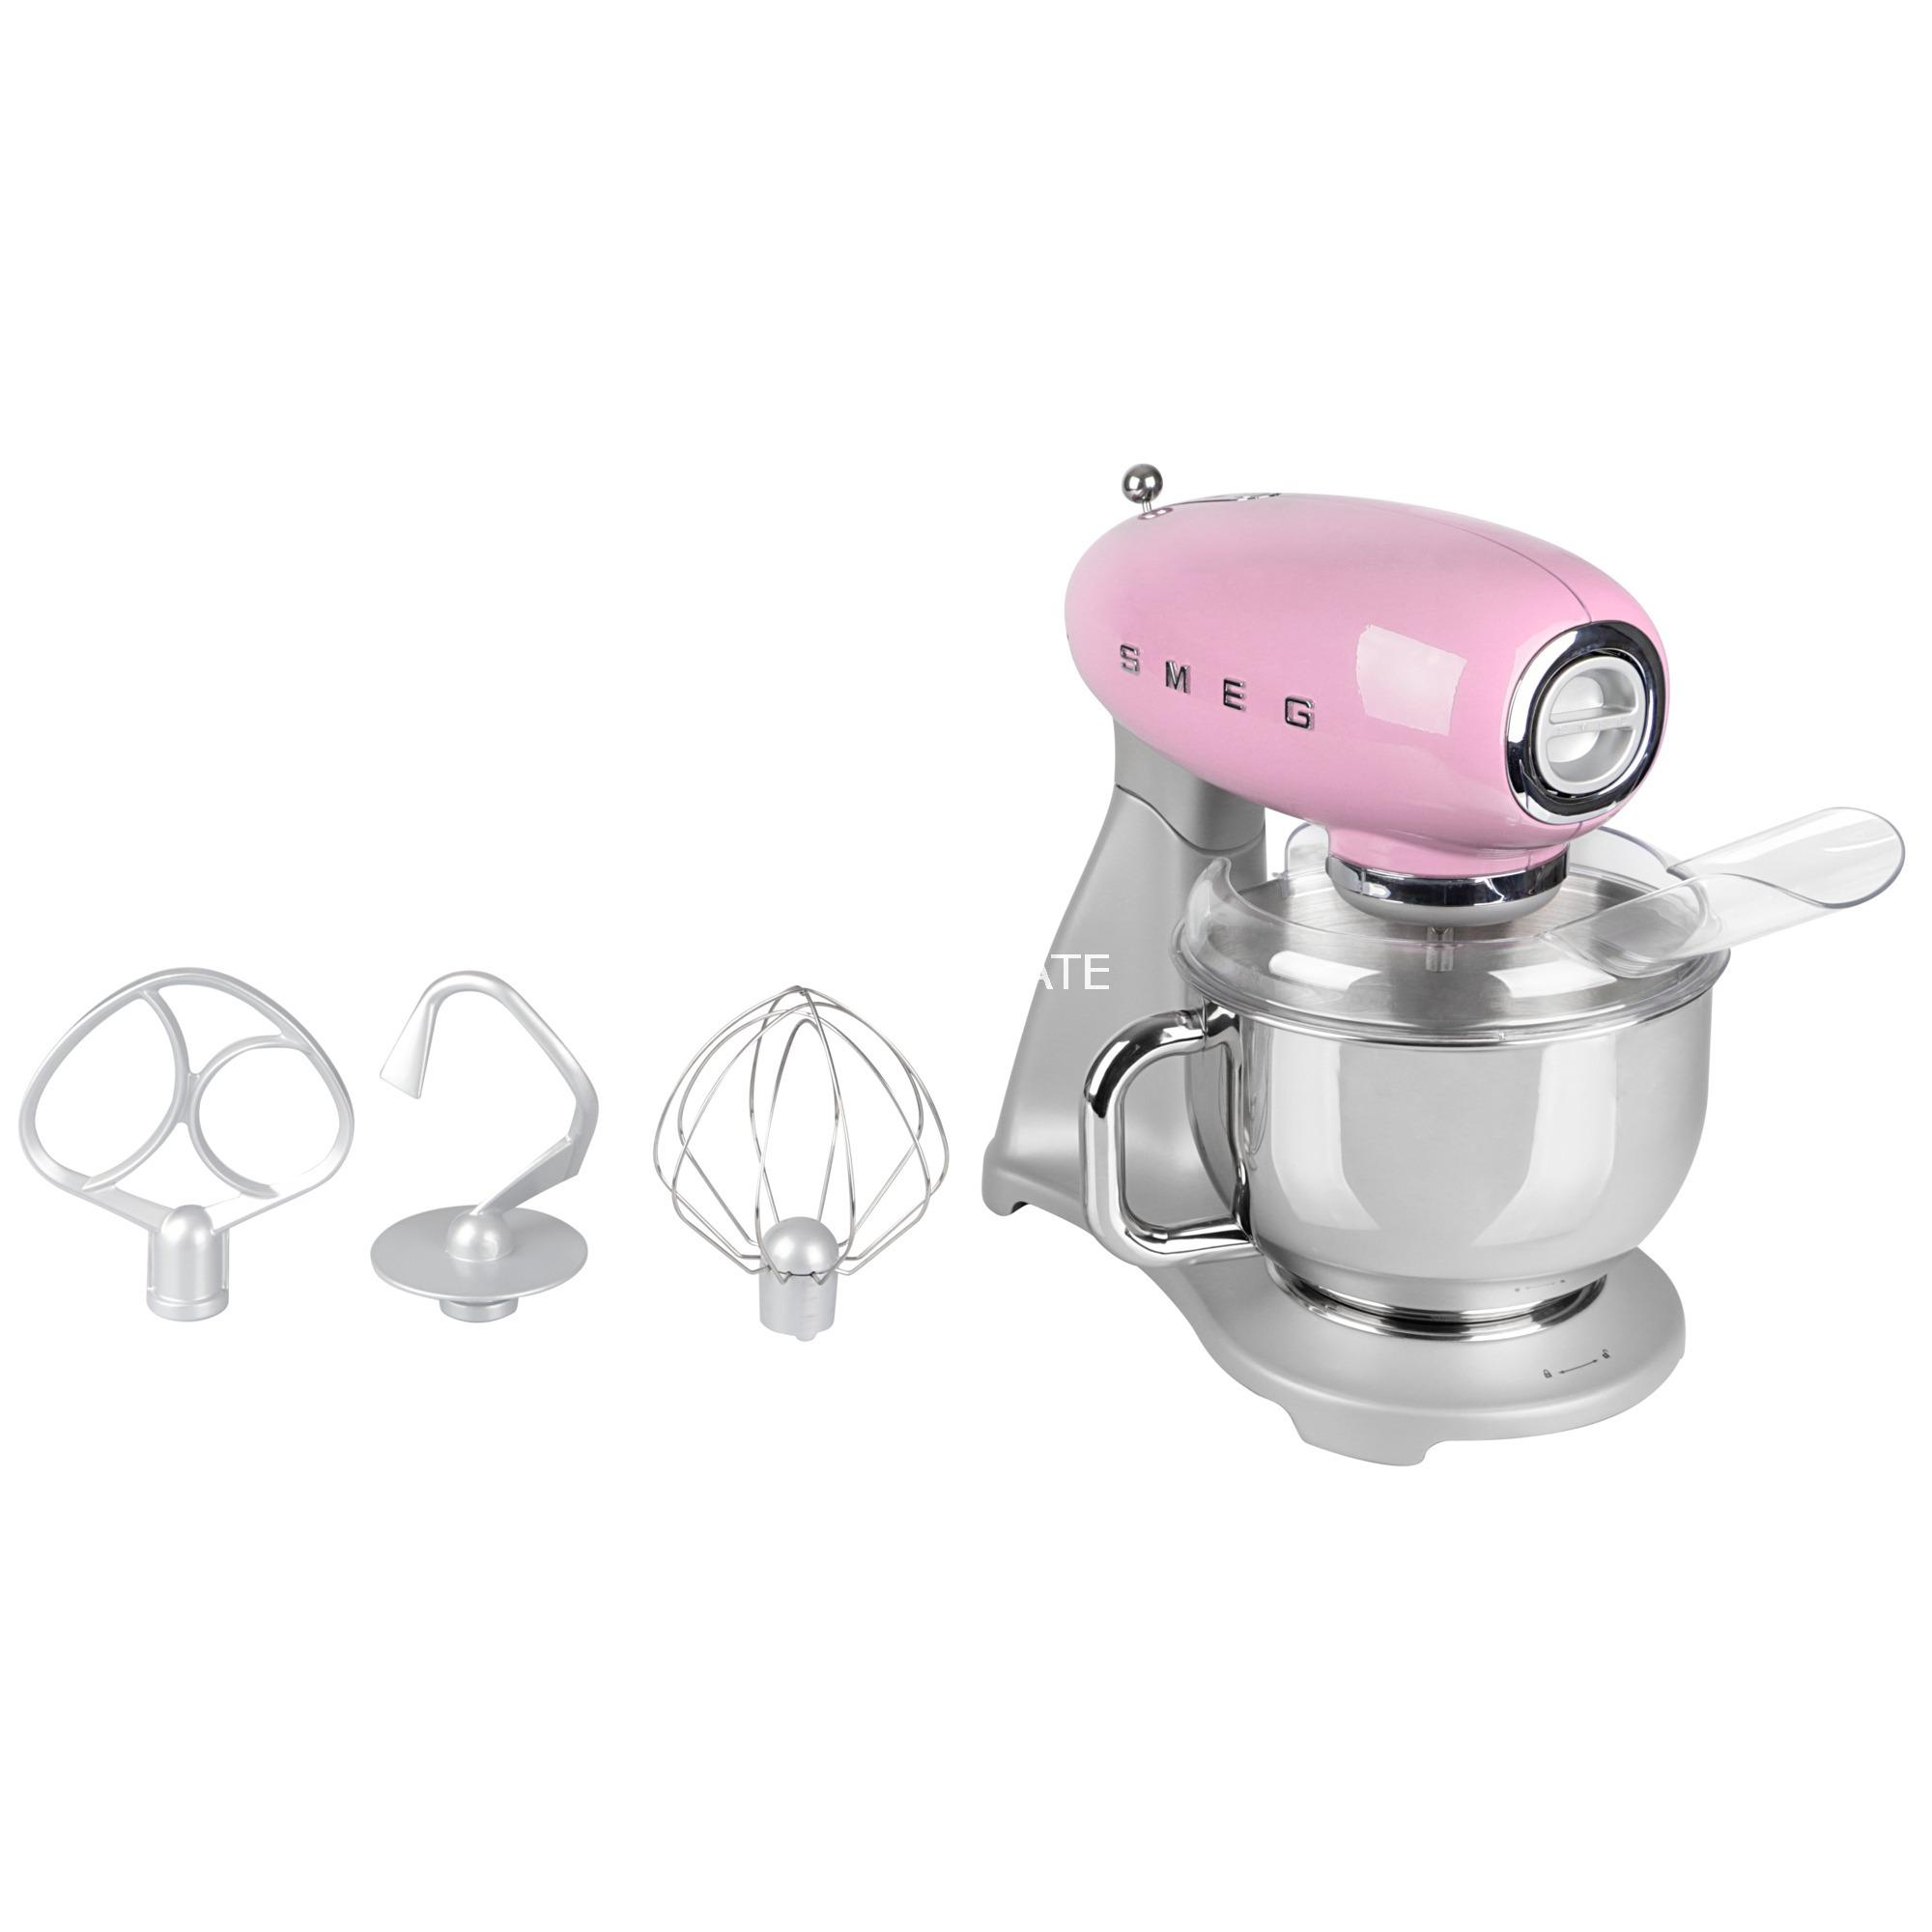 SMF01PKEU batidora Batidora de varillas Rosa 800 W, Robot de cocina